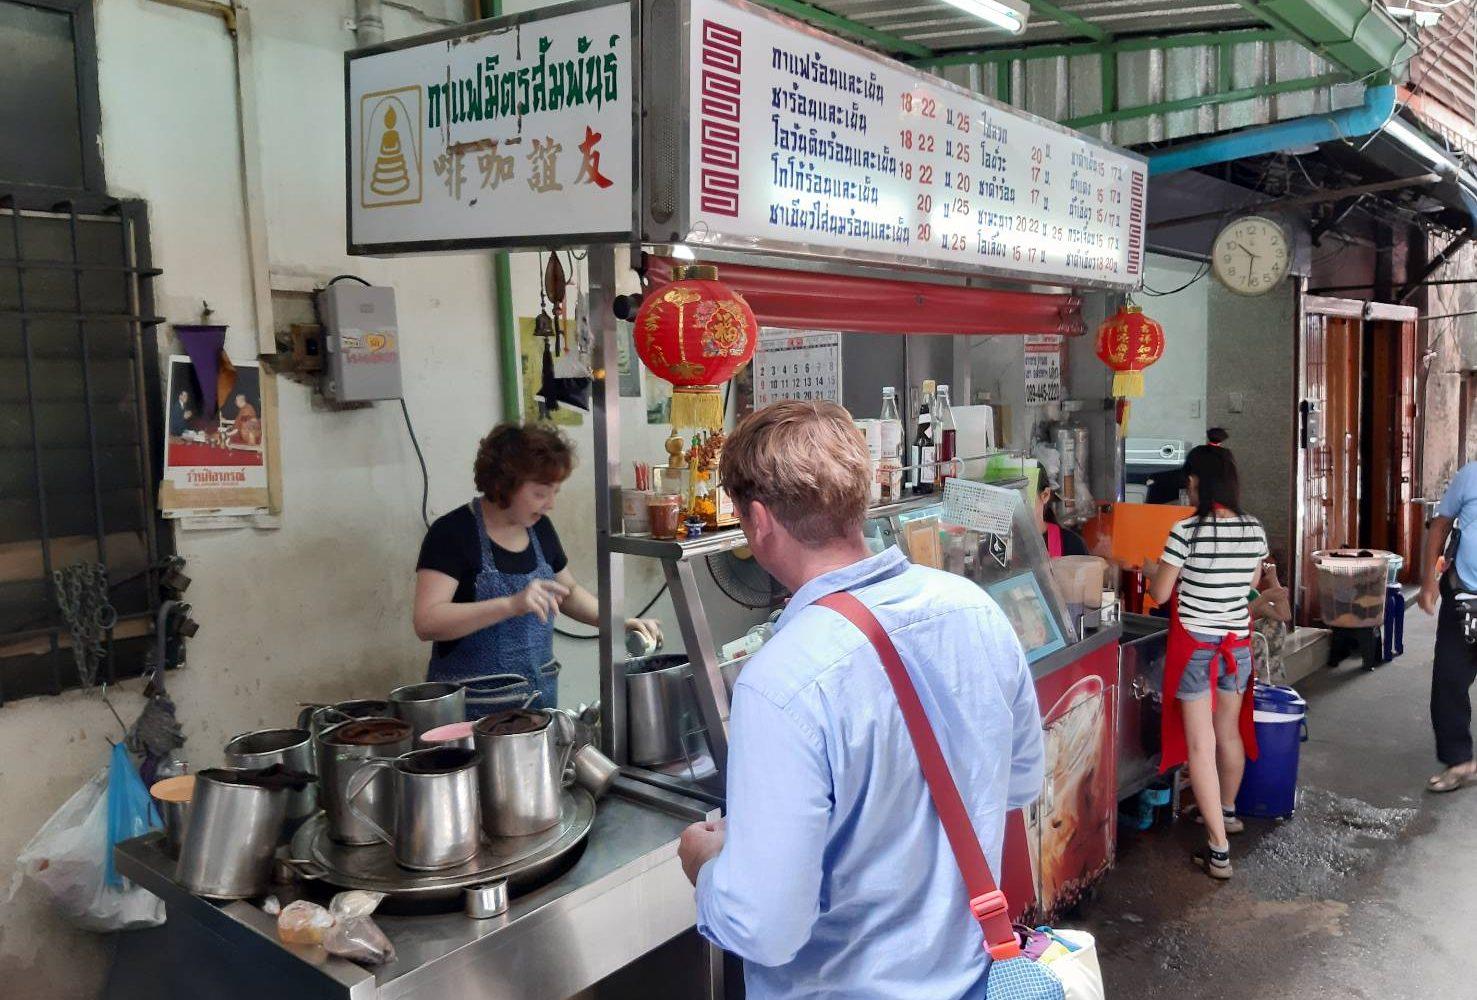 CoffeeShop China Town